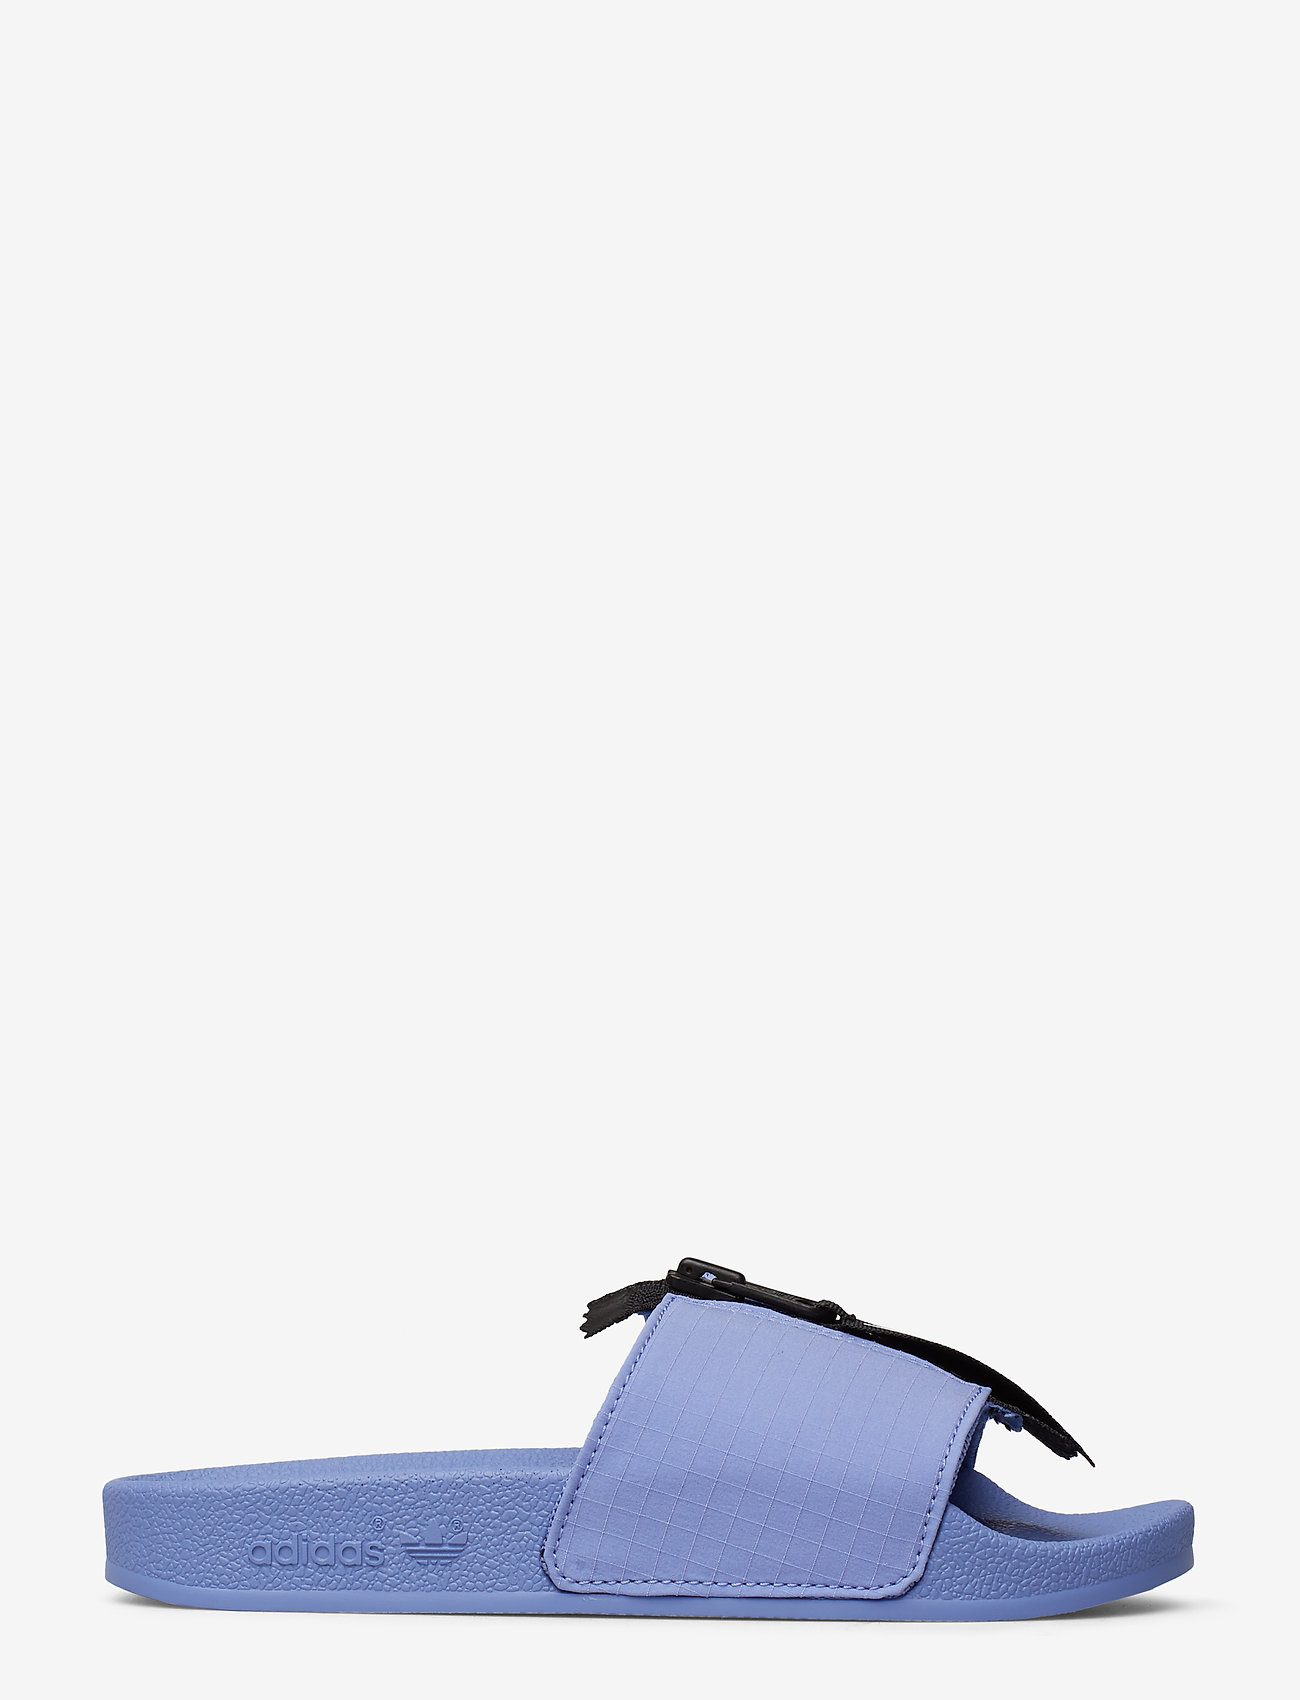 adidas Originals - ADILETTE ZIP W - sneakers - chapur/cblack/ftwwht - 1